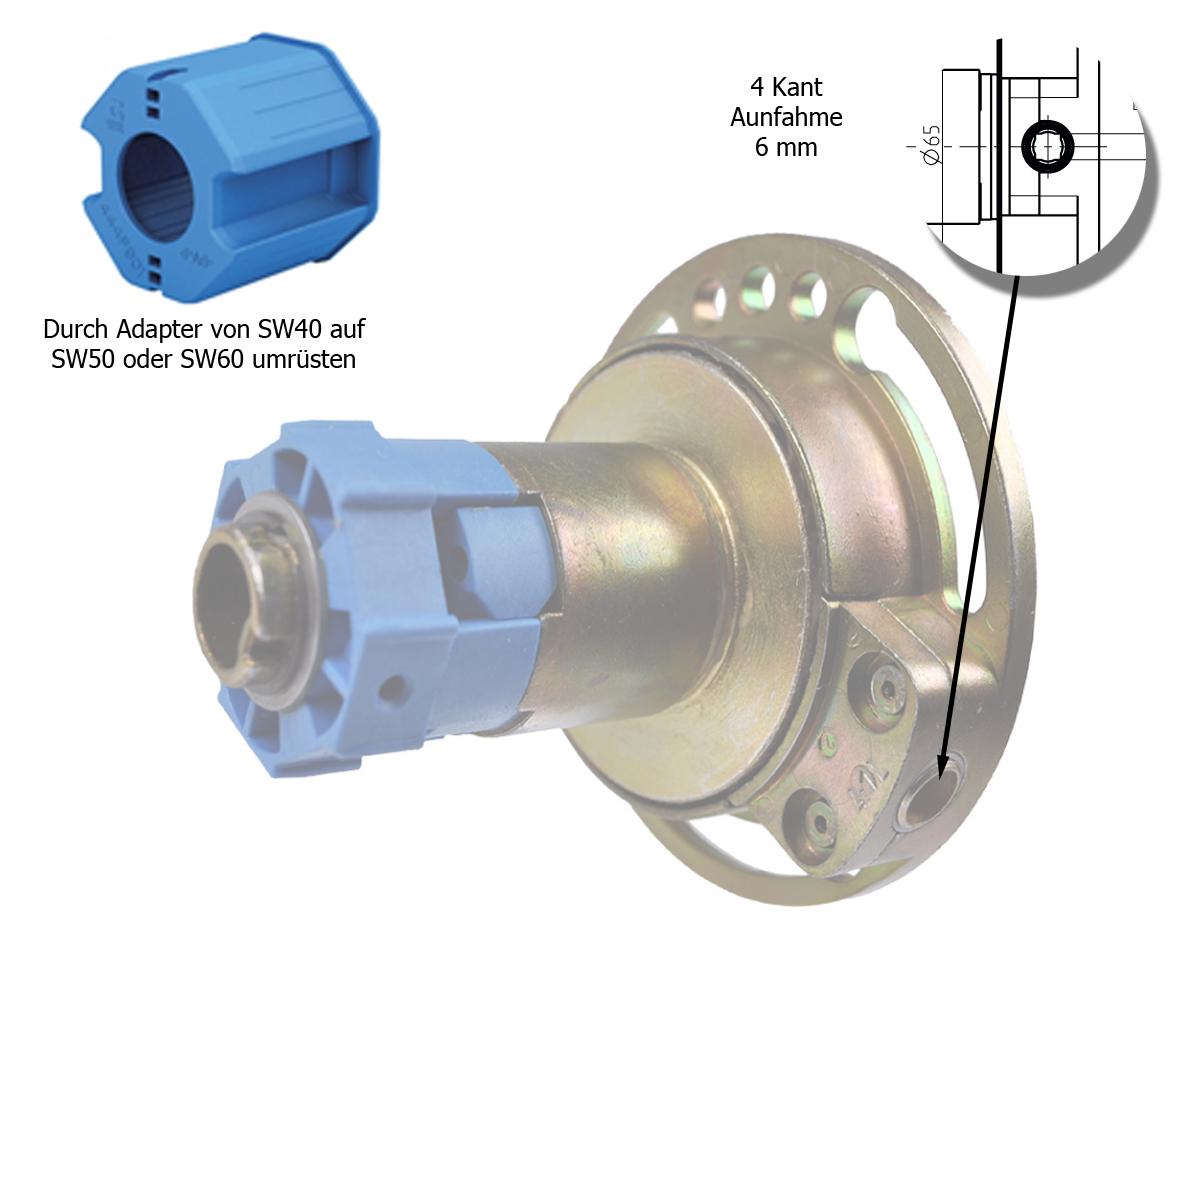 Kegelradgetriebe-4Kant-InfogsO4eD821Ochf